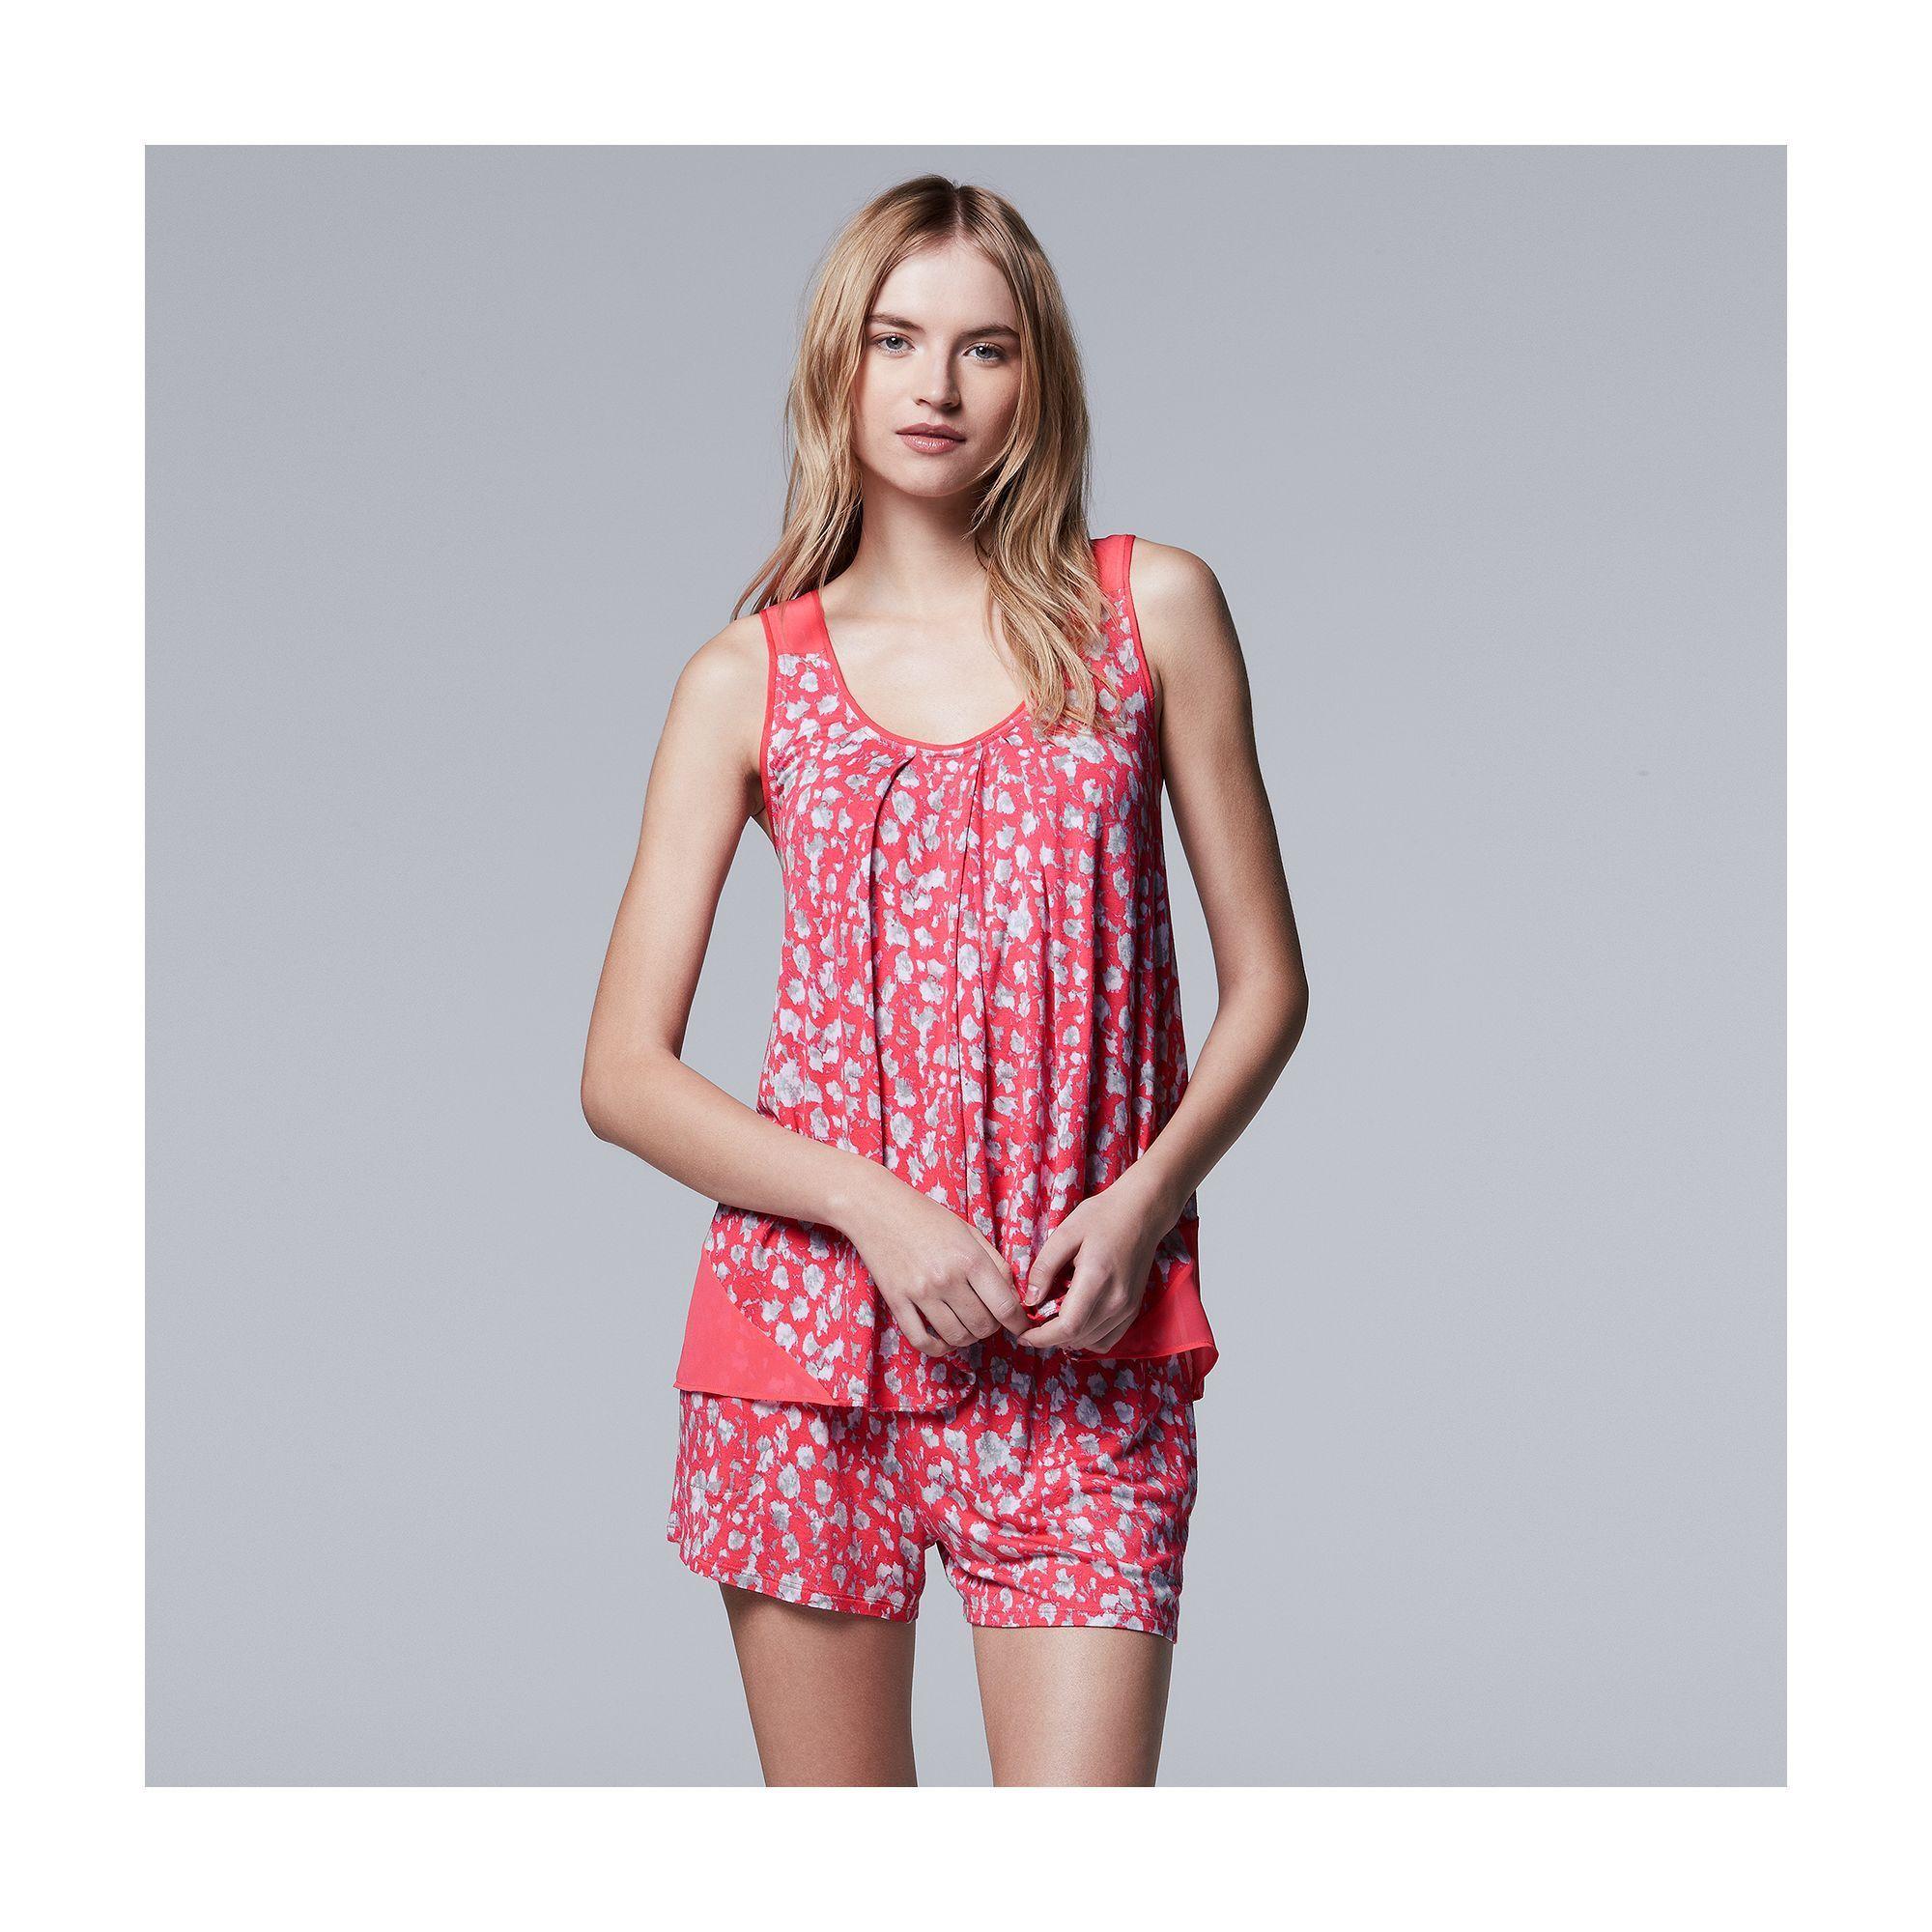 4069ef5ae559 Women s Simply Vera Vera Wang Pajamas  Spring Petals Tank   Boxer Shorts PJ  Set